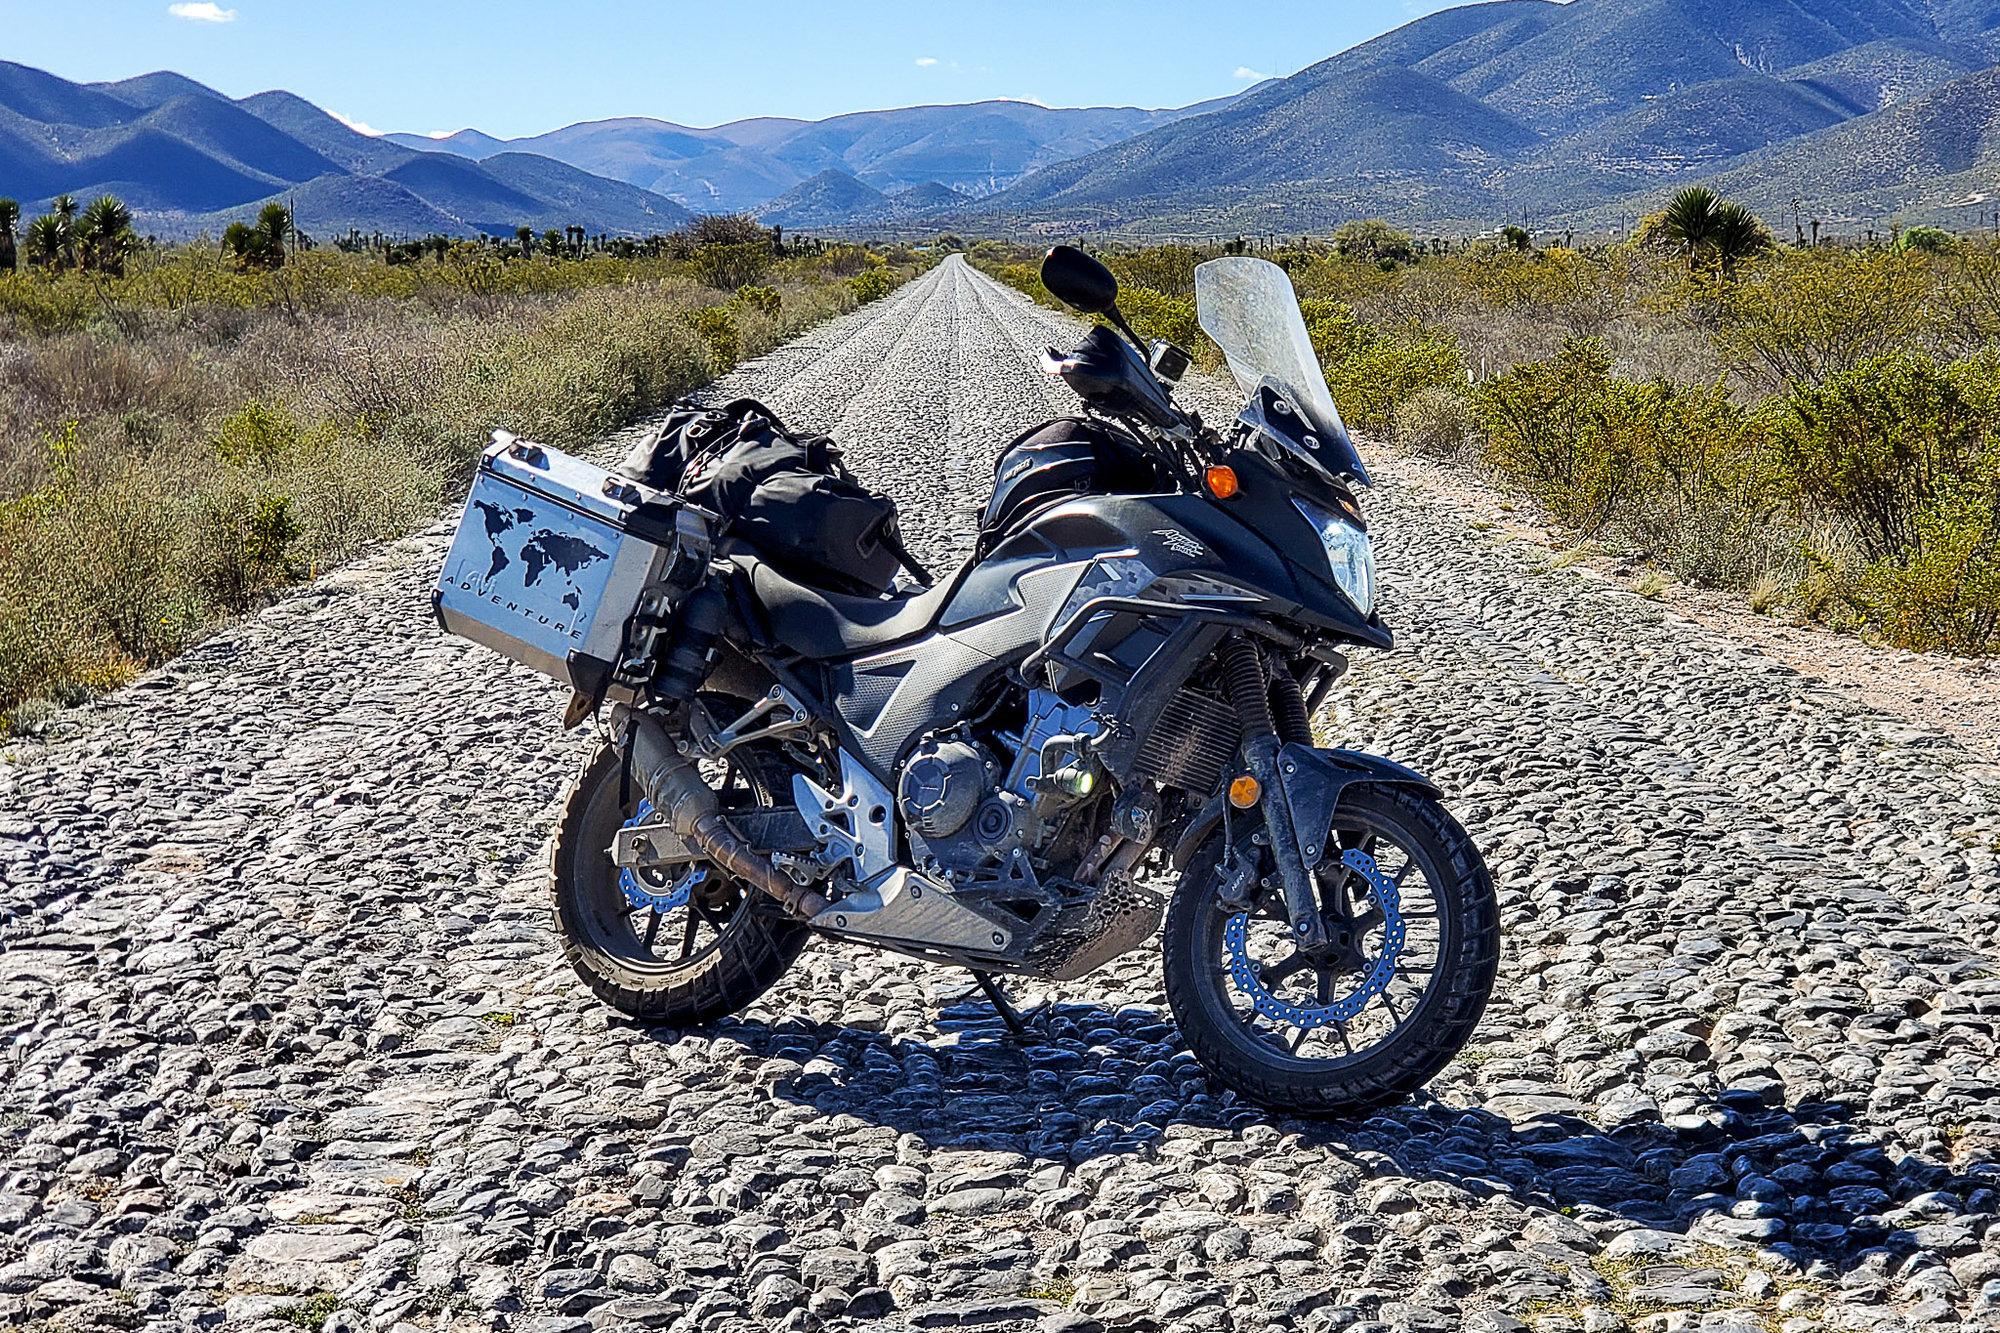 200114-Moto-Photo-Mexico-0502.jpg